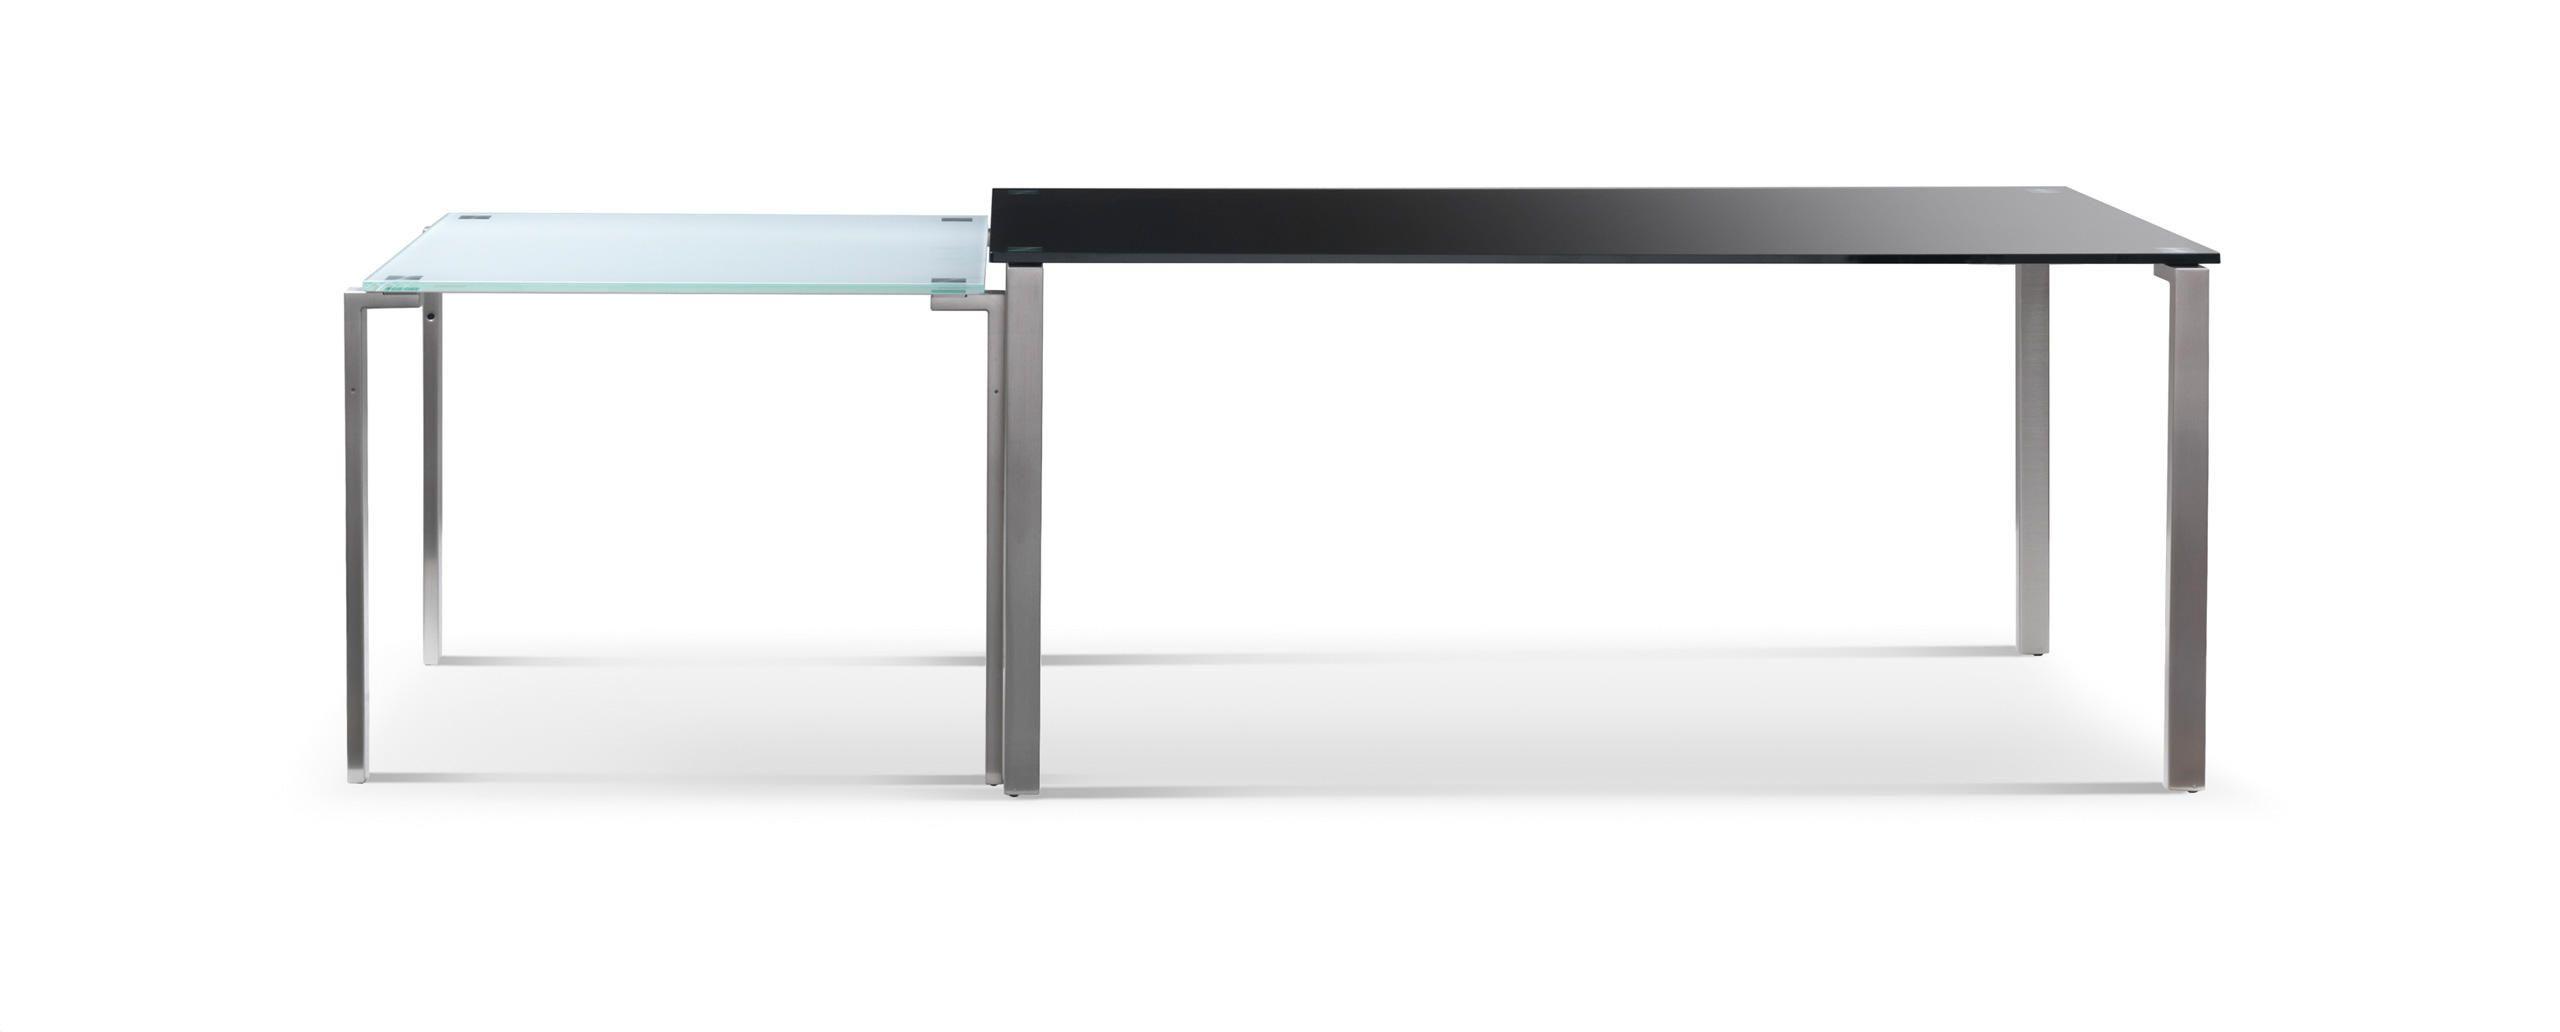 W31 32 1 2 Jean Nouvel Cassina Tavolo Design Tavoli Da Pranzo Tavoli